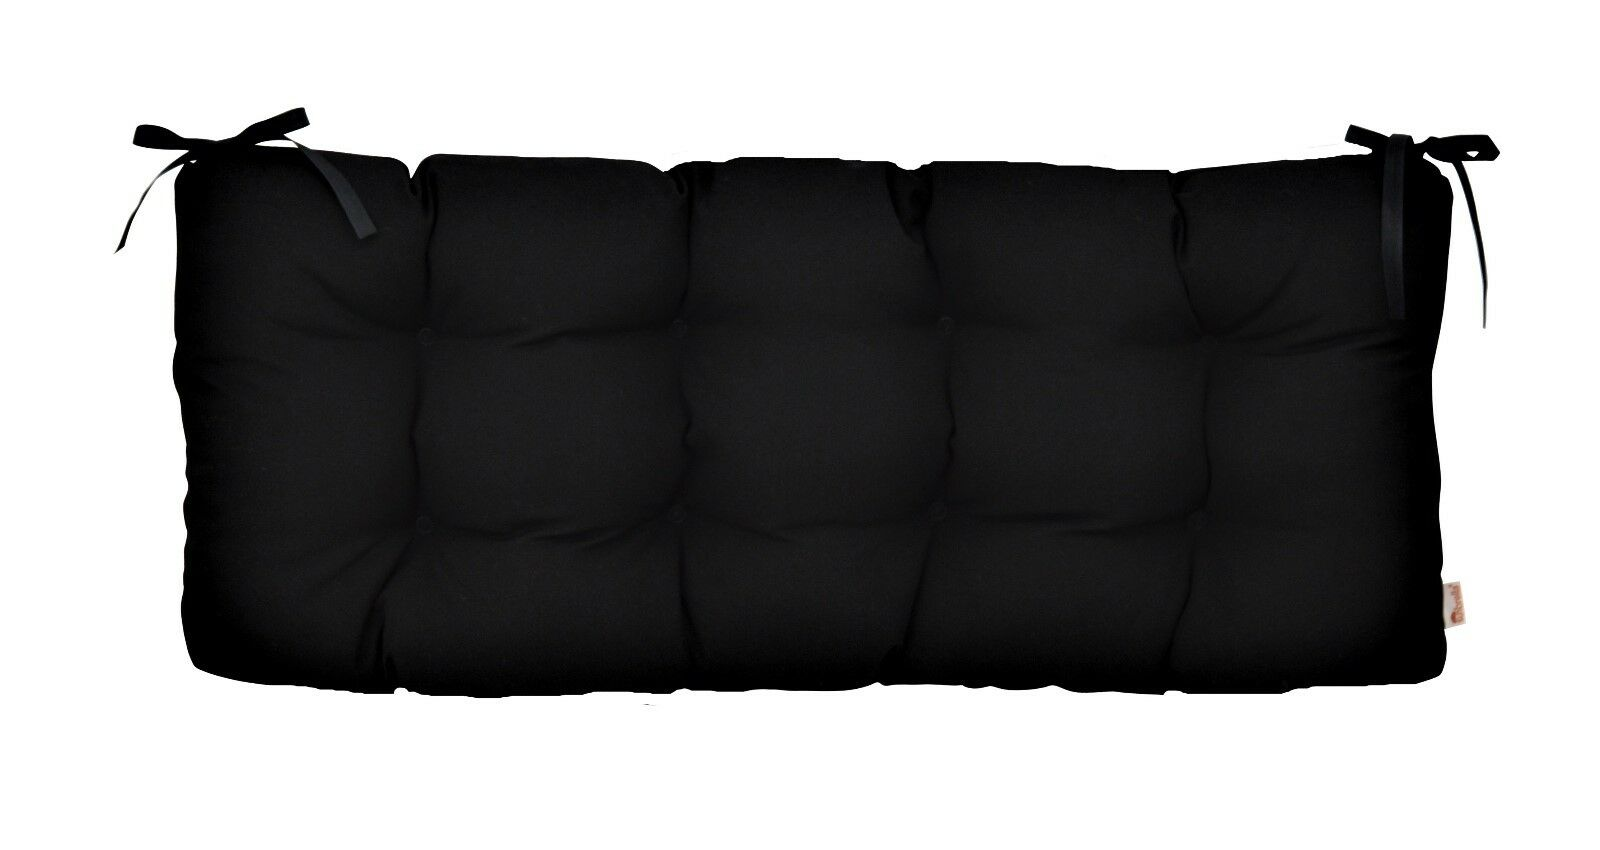 Sunbrella Canvas Black Indoor Outdoor Tufted Bench Cushion w